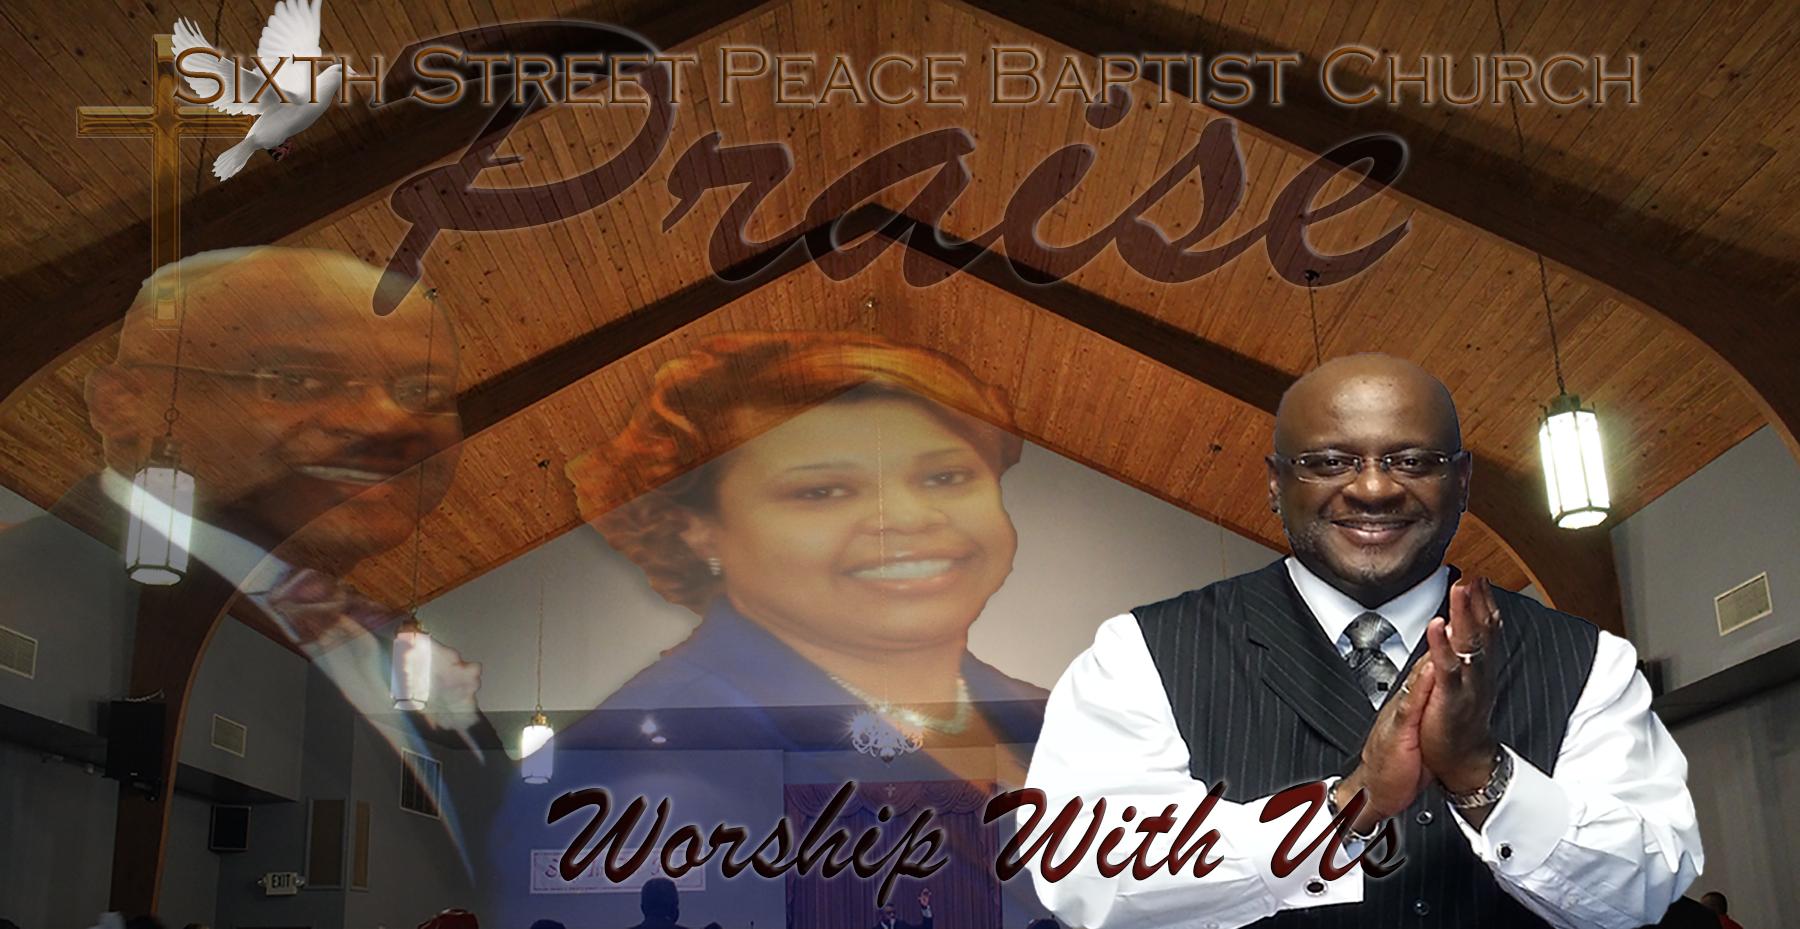 Pastor & First Lady LaTasha Caldwell